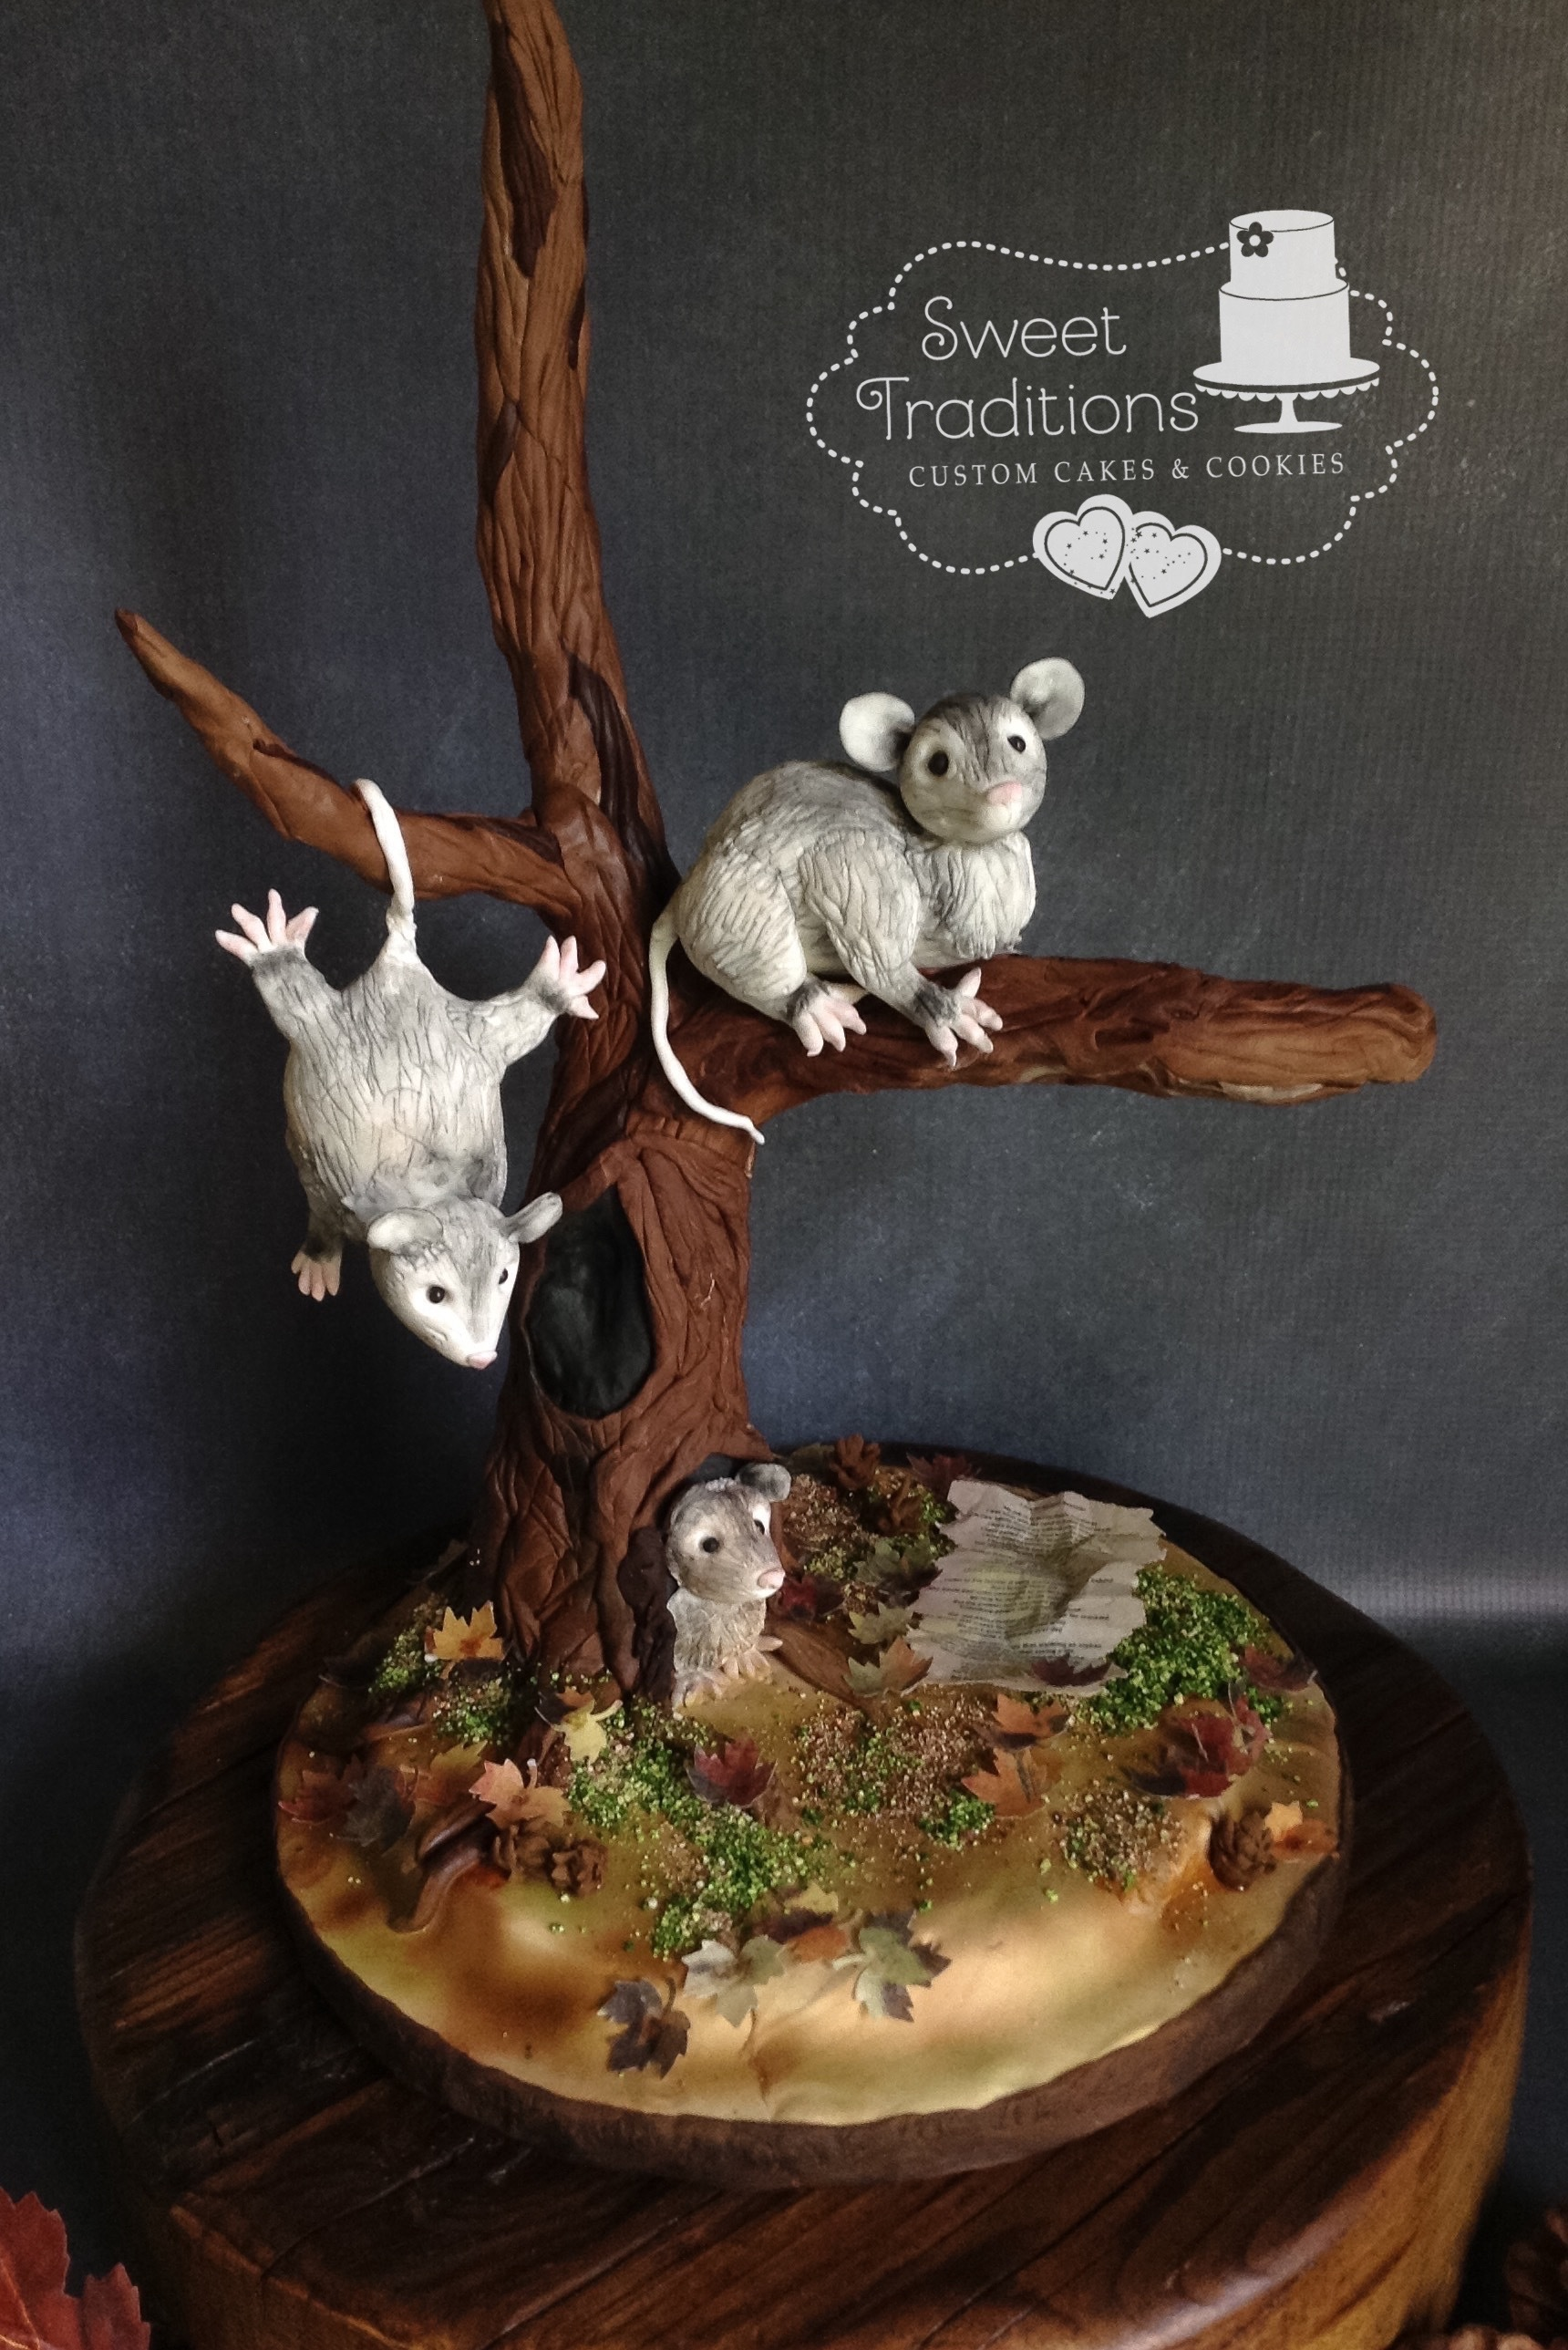 Animal-Rights-Nancy-Cross-Sweet-Traditions-Opossum.jpeg#asset:13729